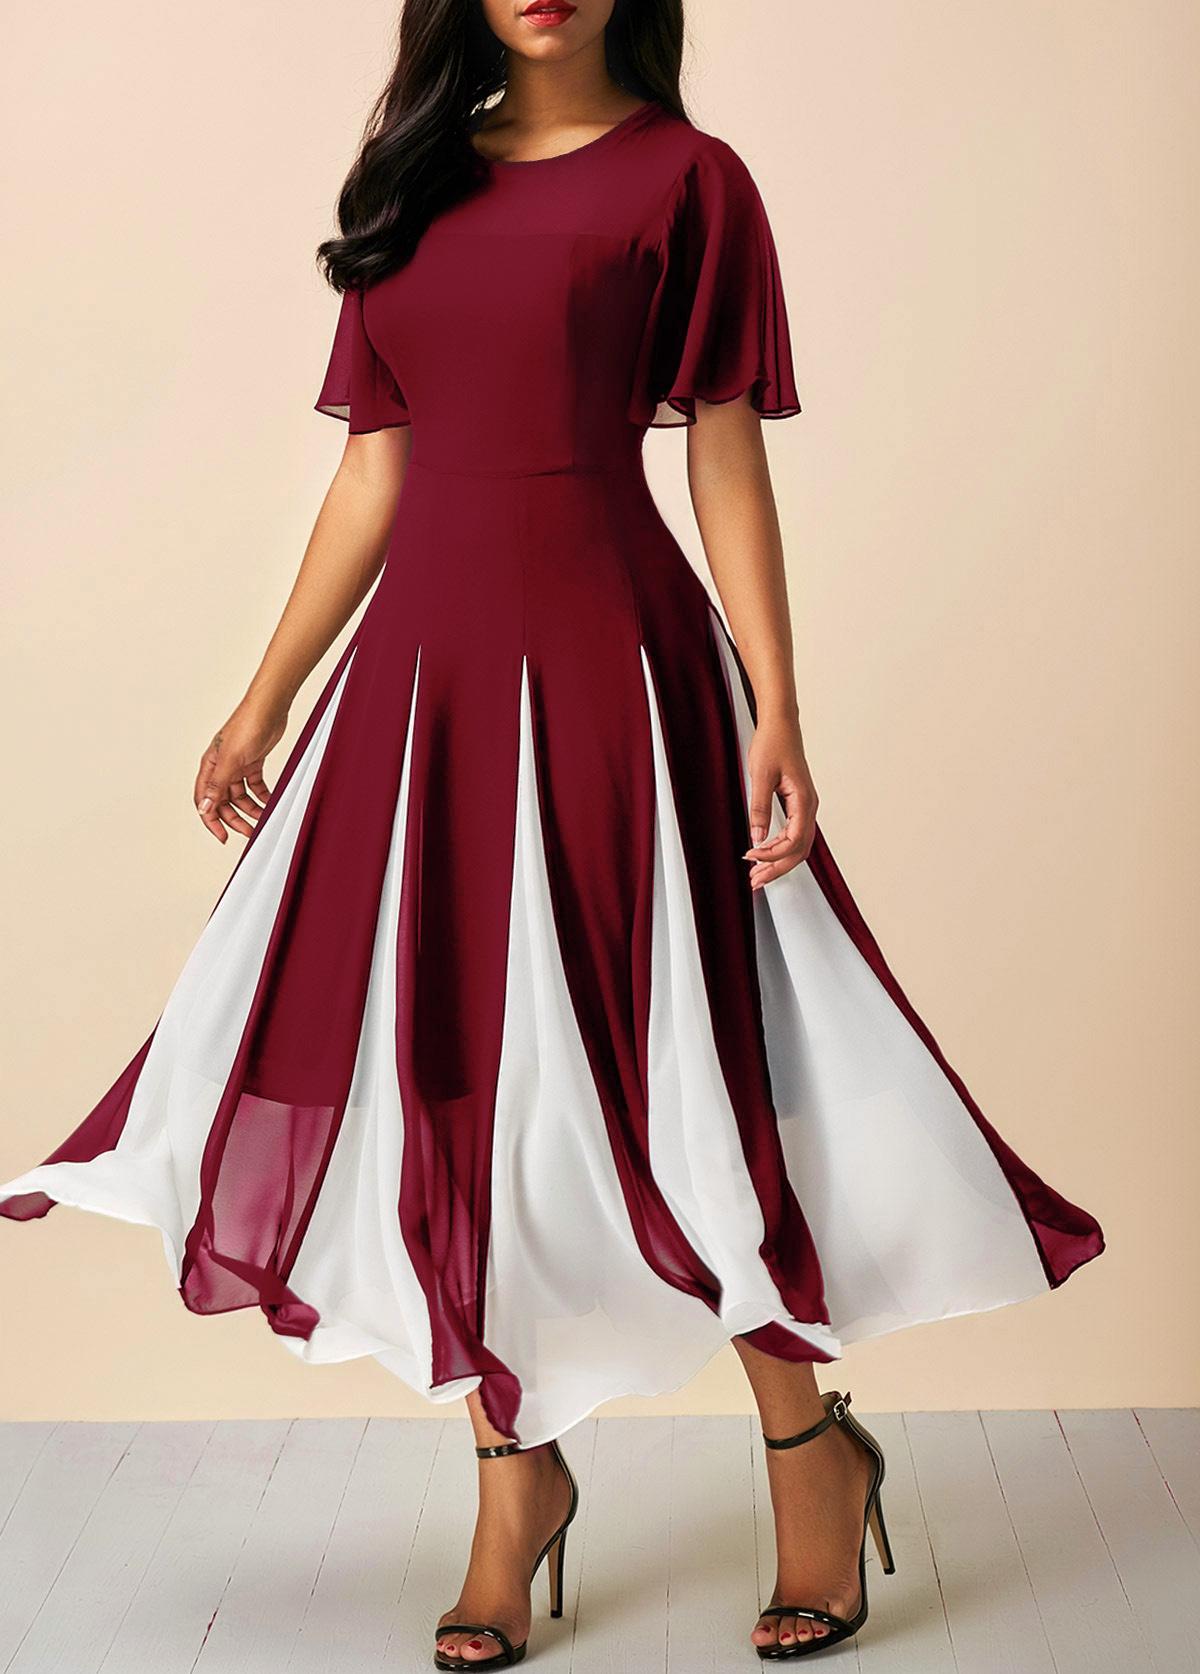 Wine Red Round Neck Short Sleeve Chiffon Dress